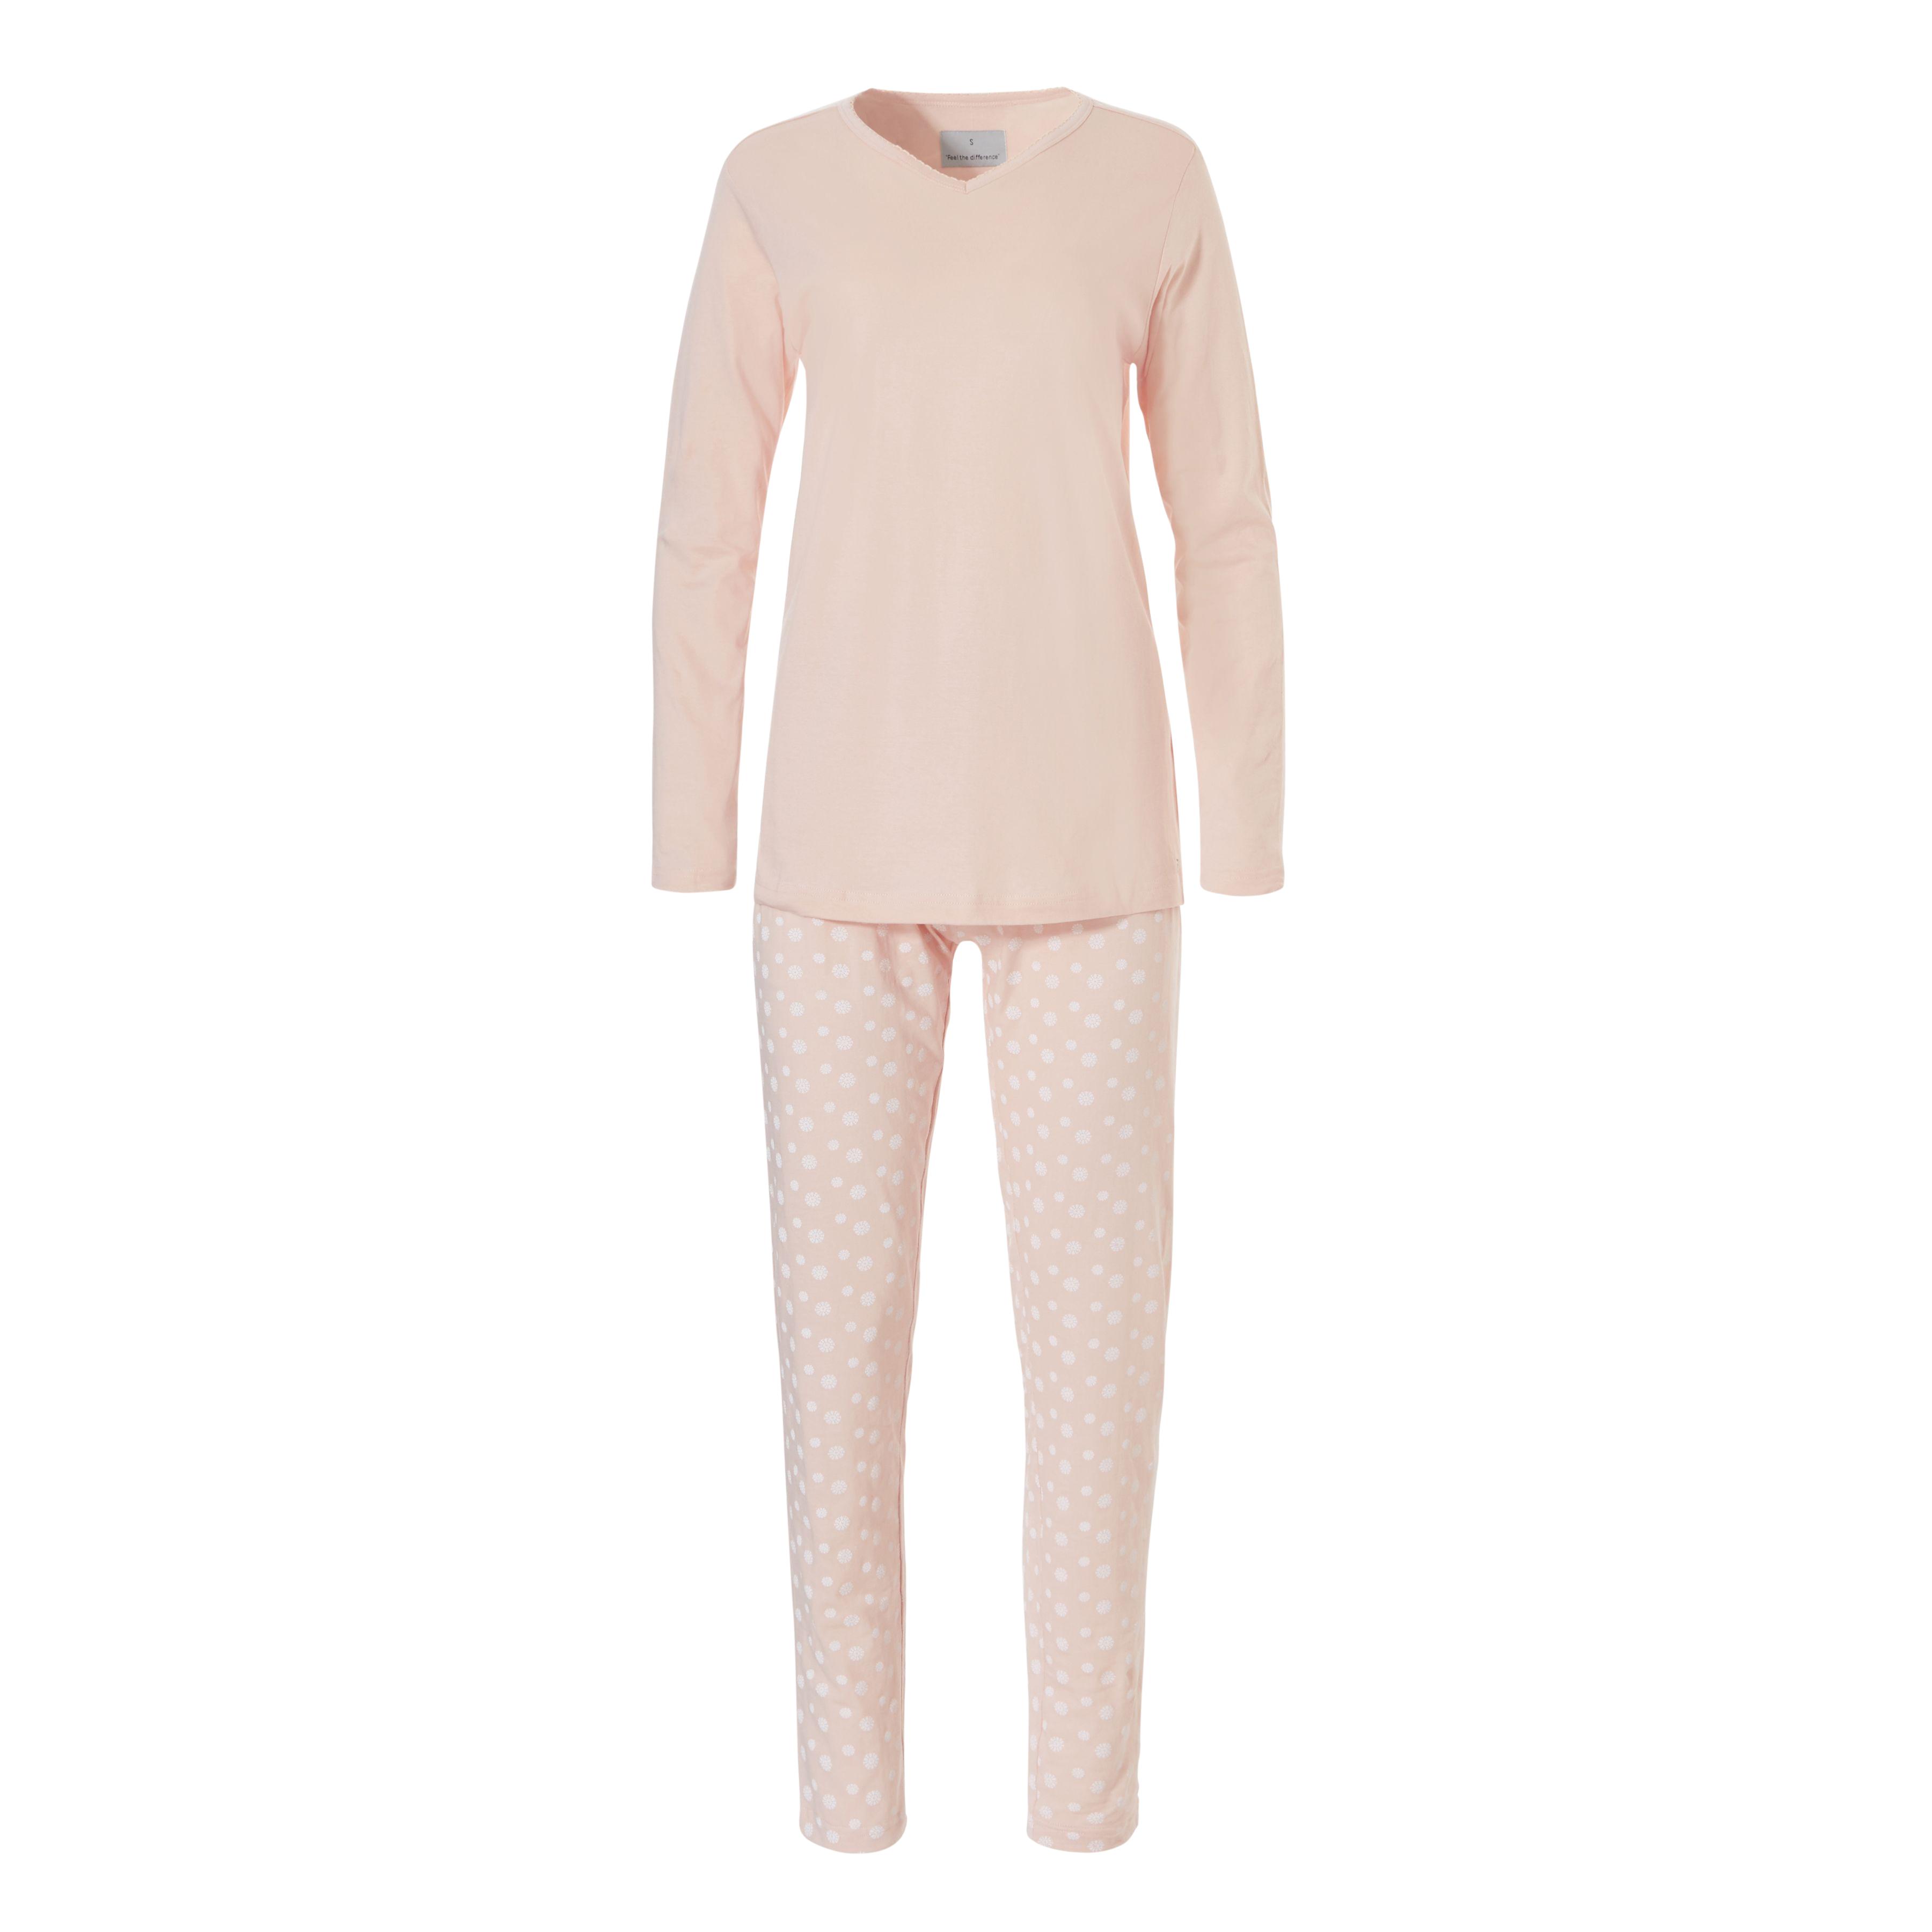 Ten Cate dames Pyjama roze